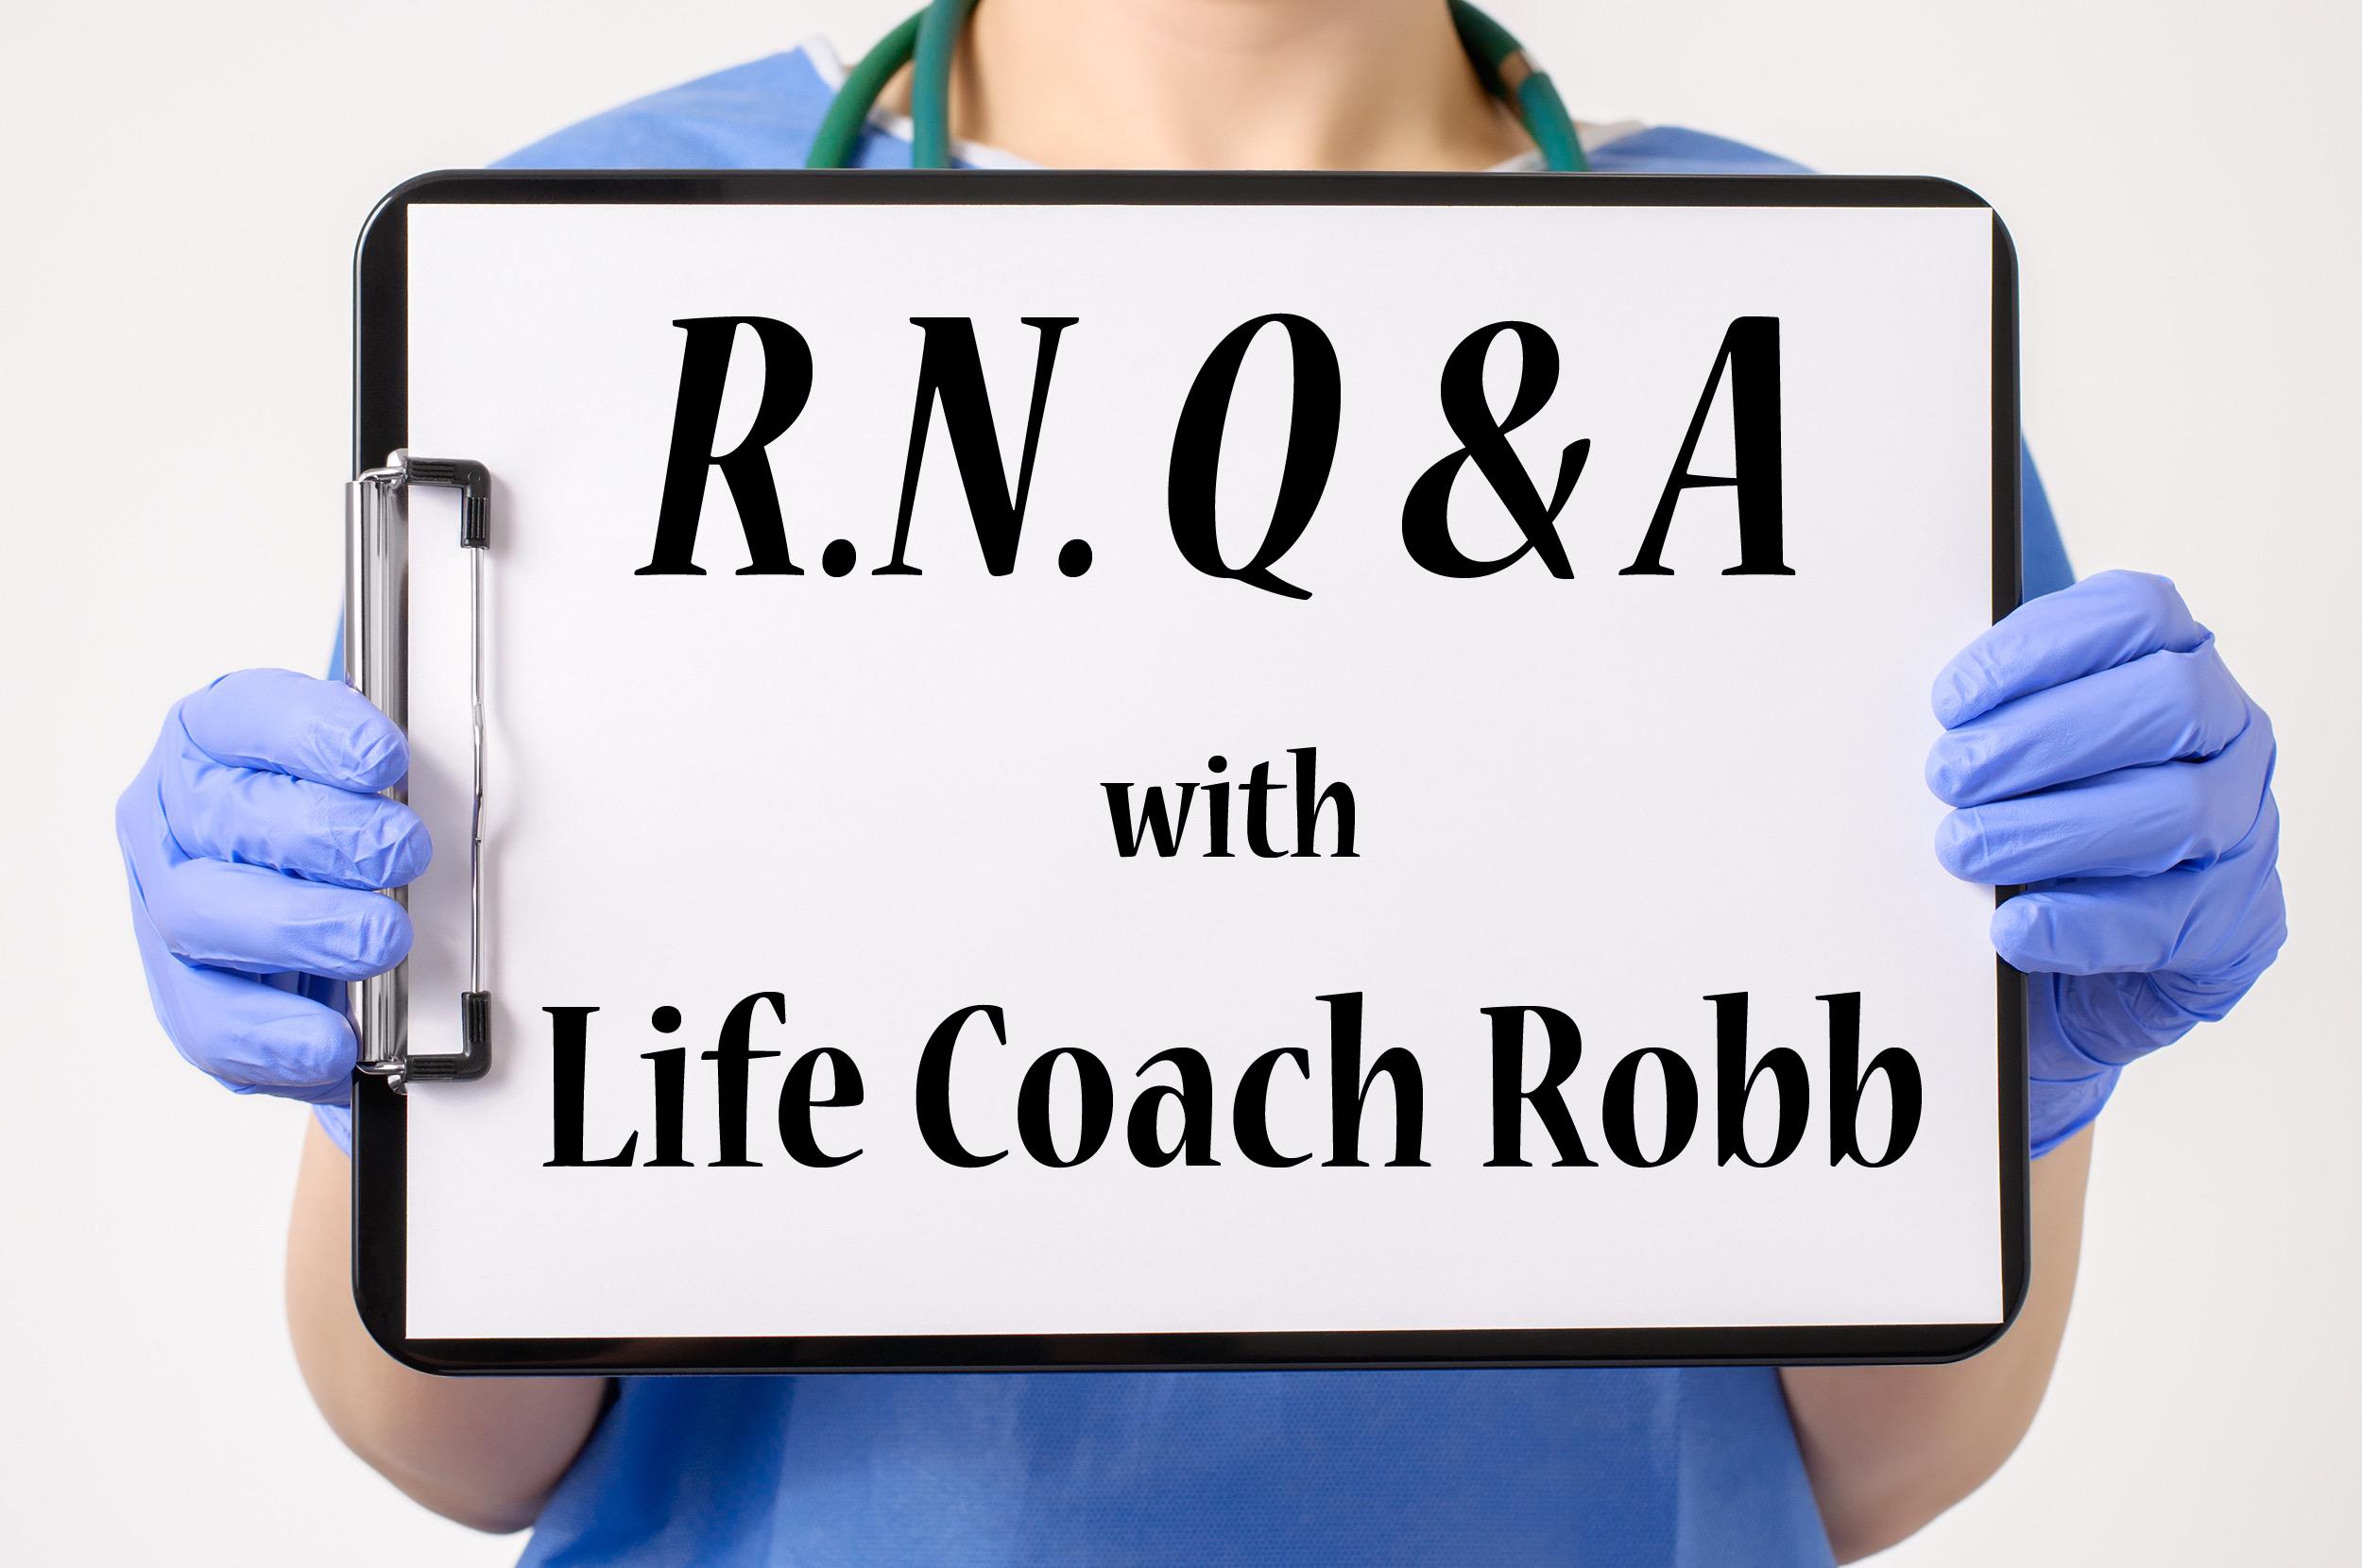 Registered Nurse Q&A